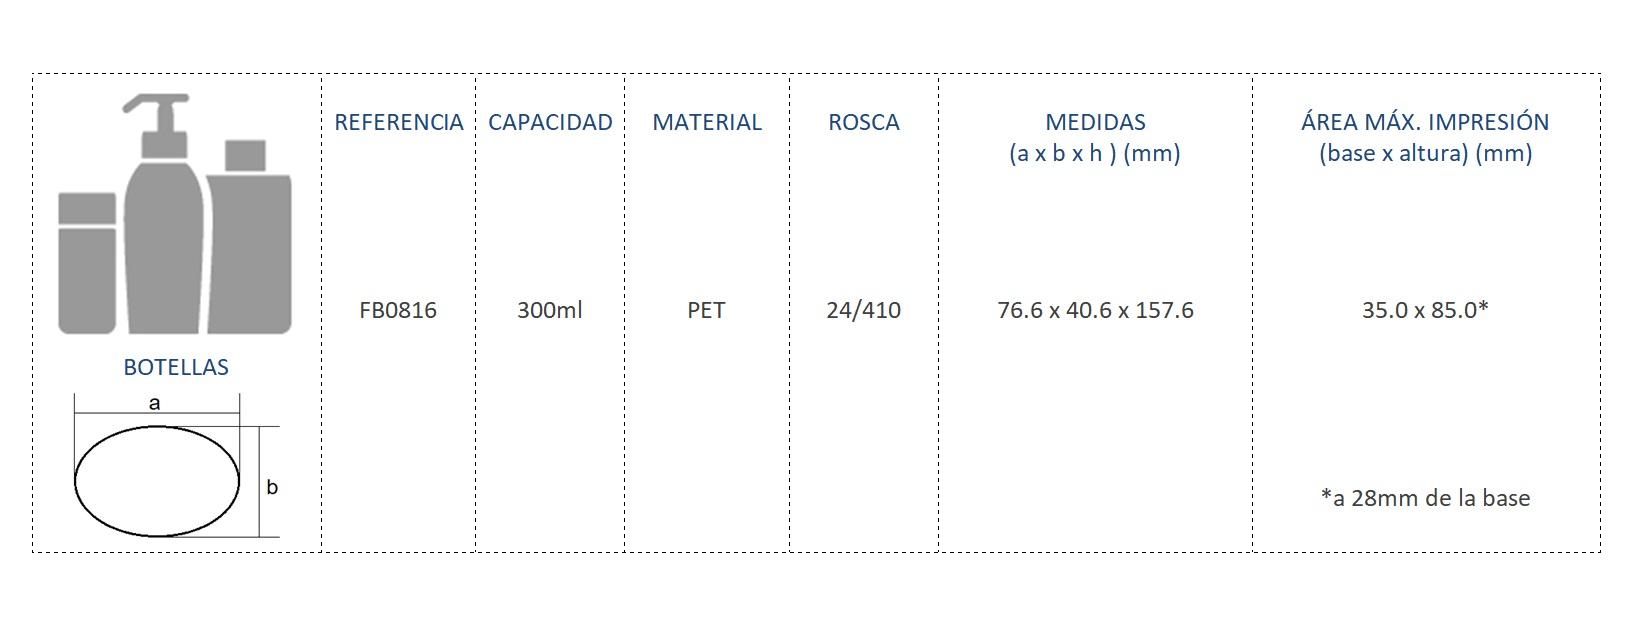 Cuadro de materiales botella FB0816